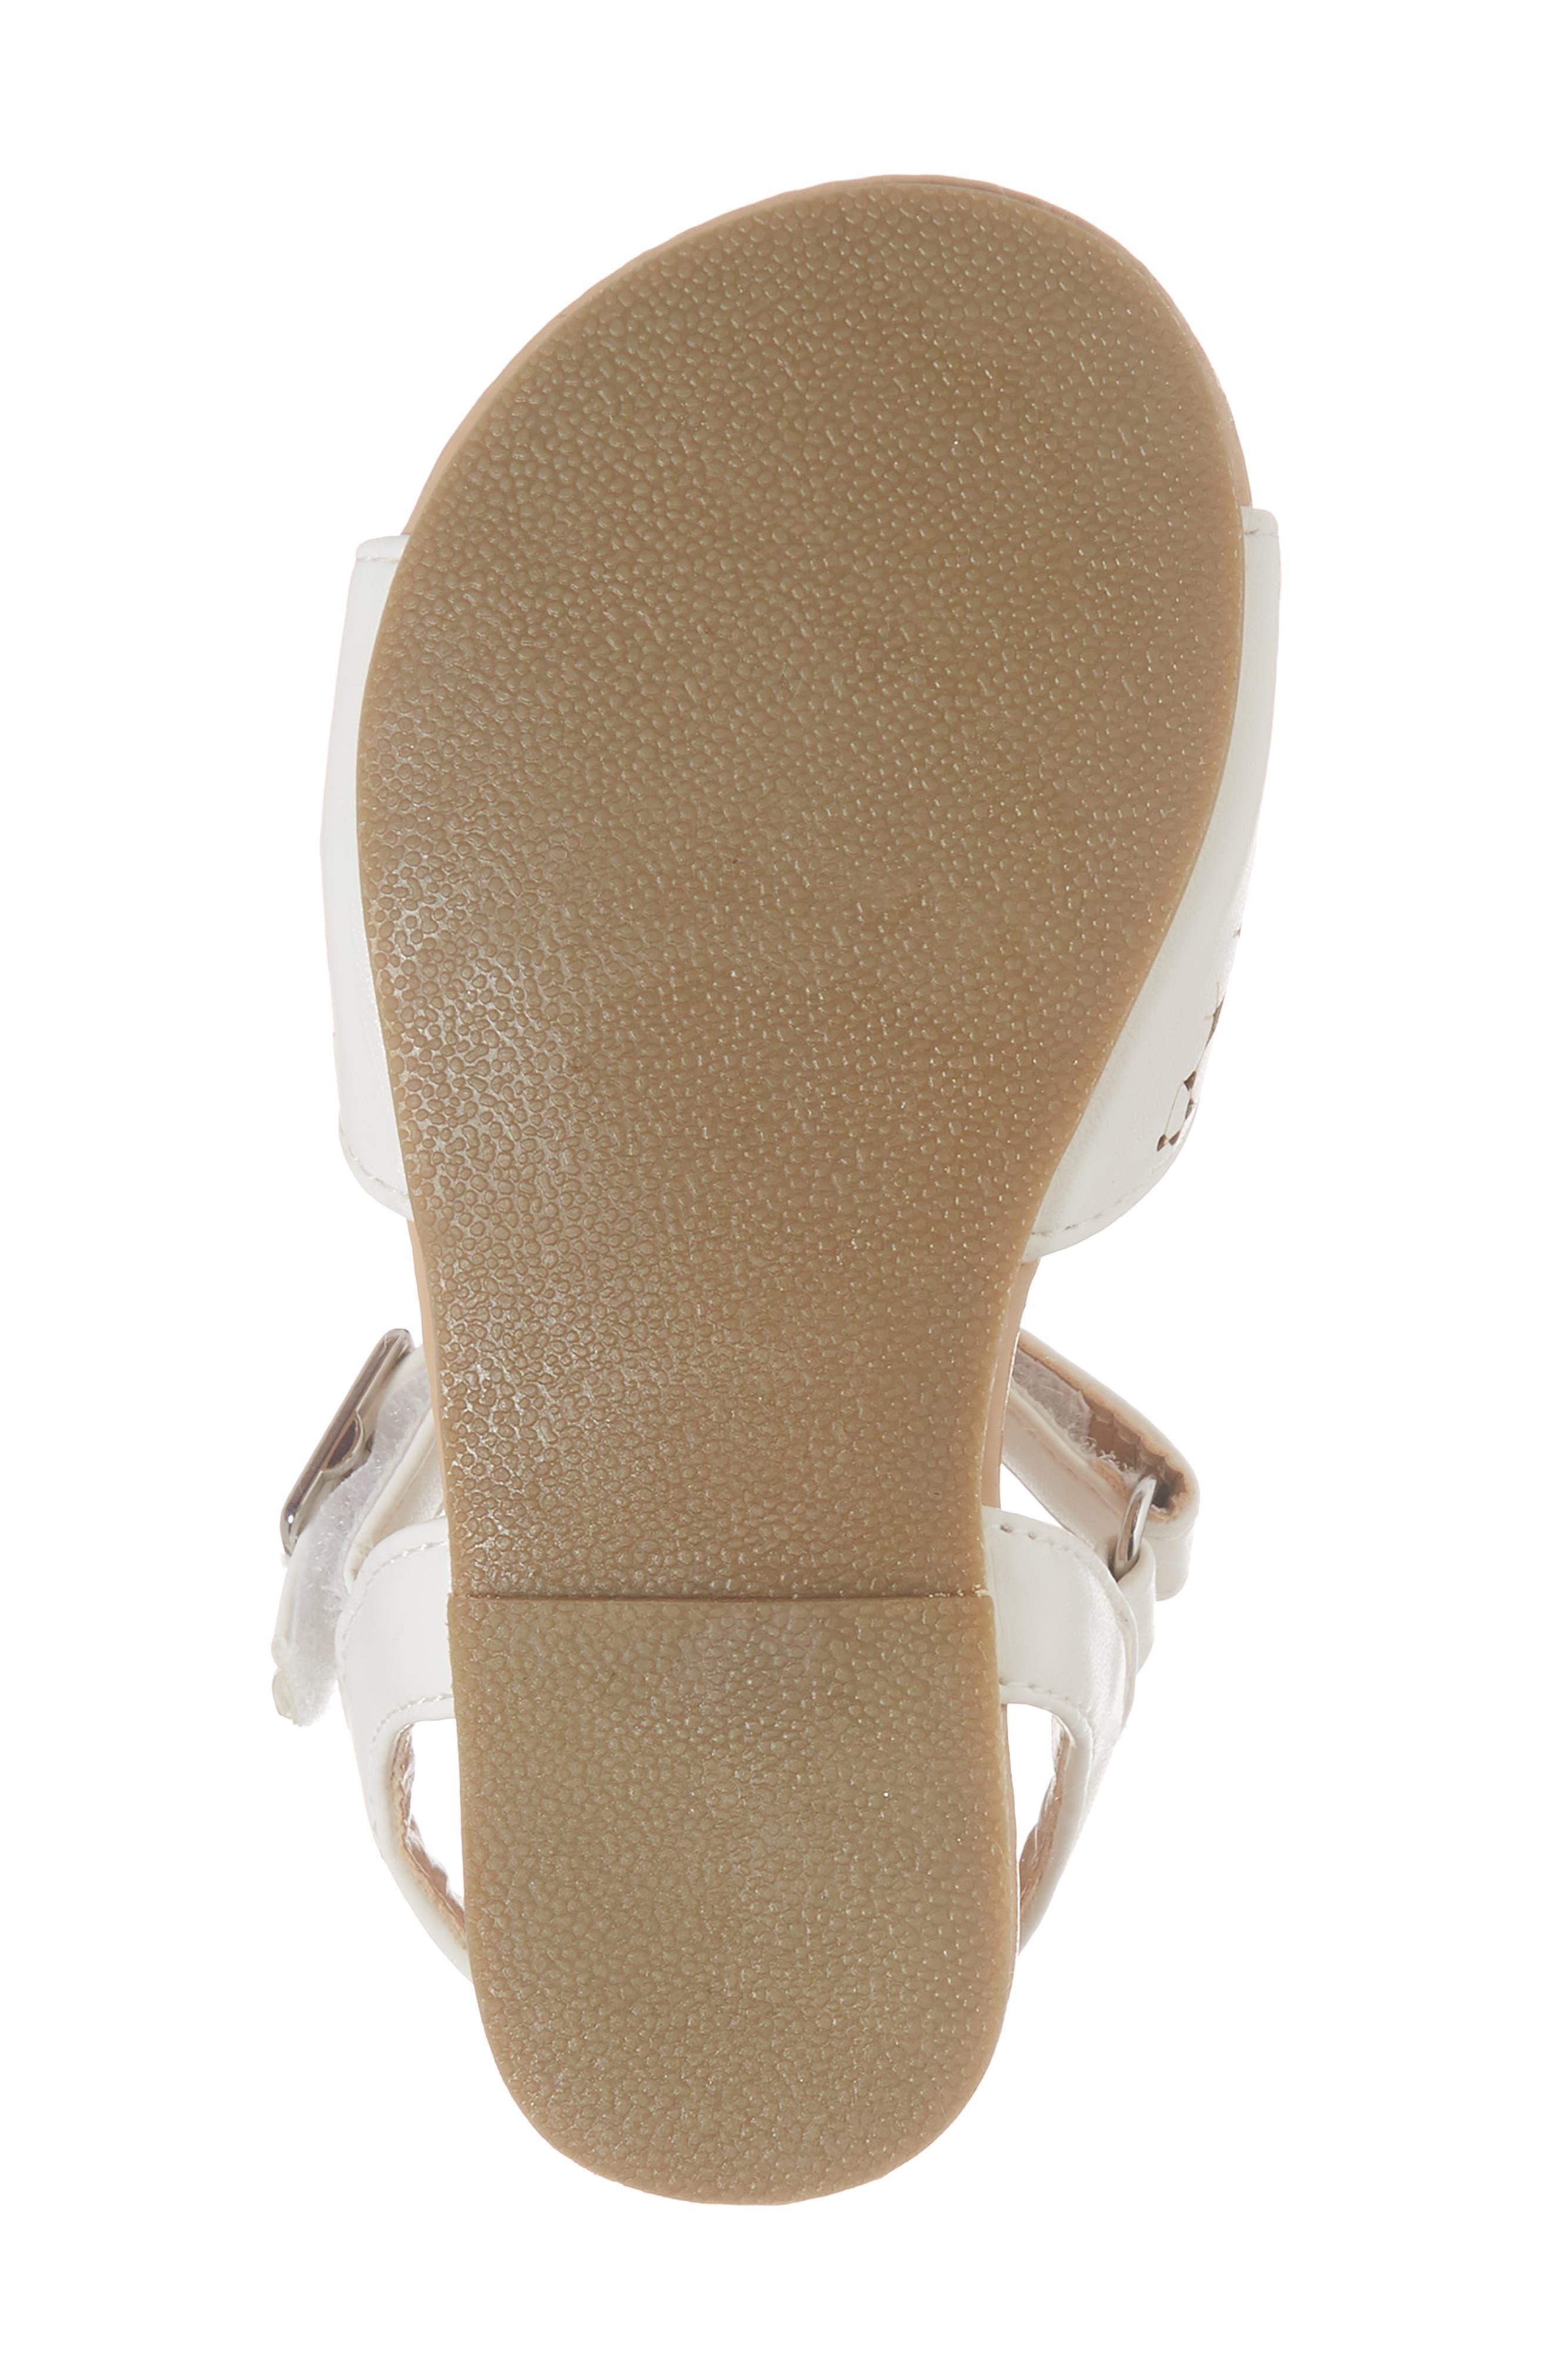 Kiera Perforated Sandal,                             Alternate thumbnail 6, color,                             100